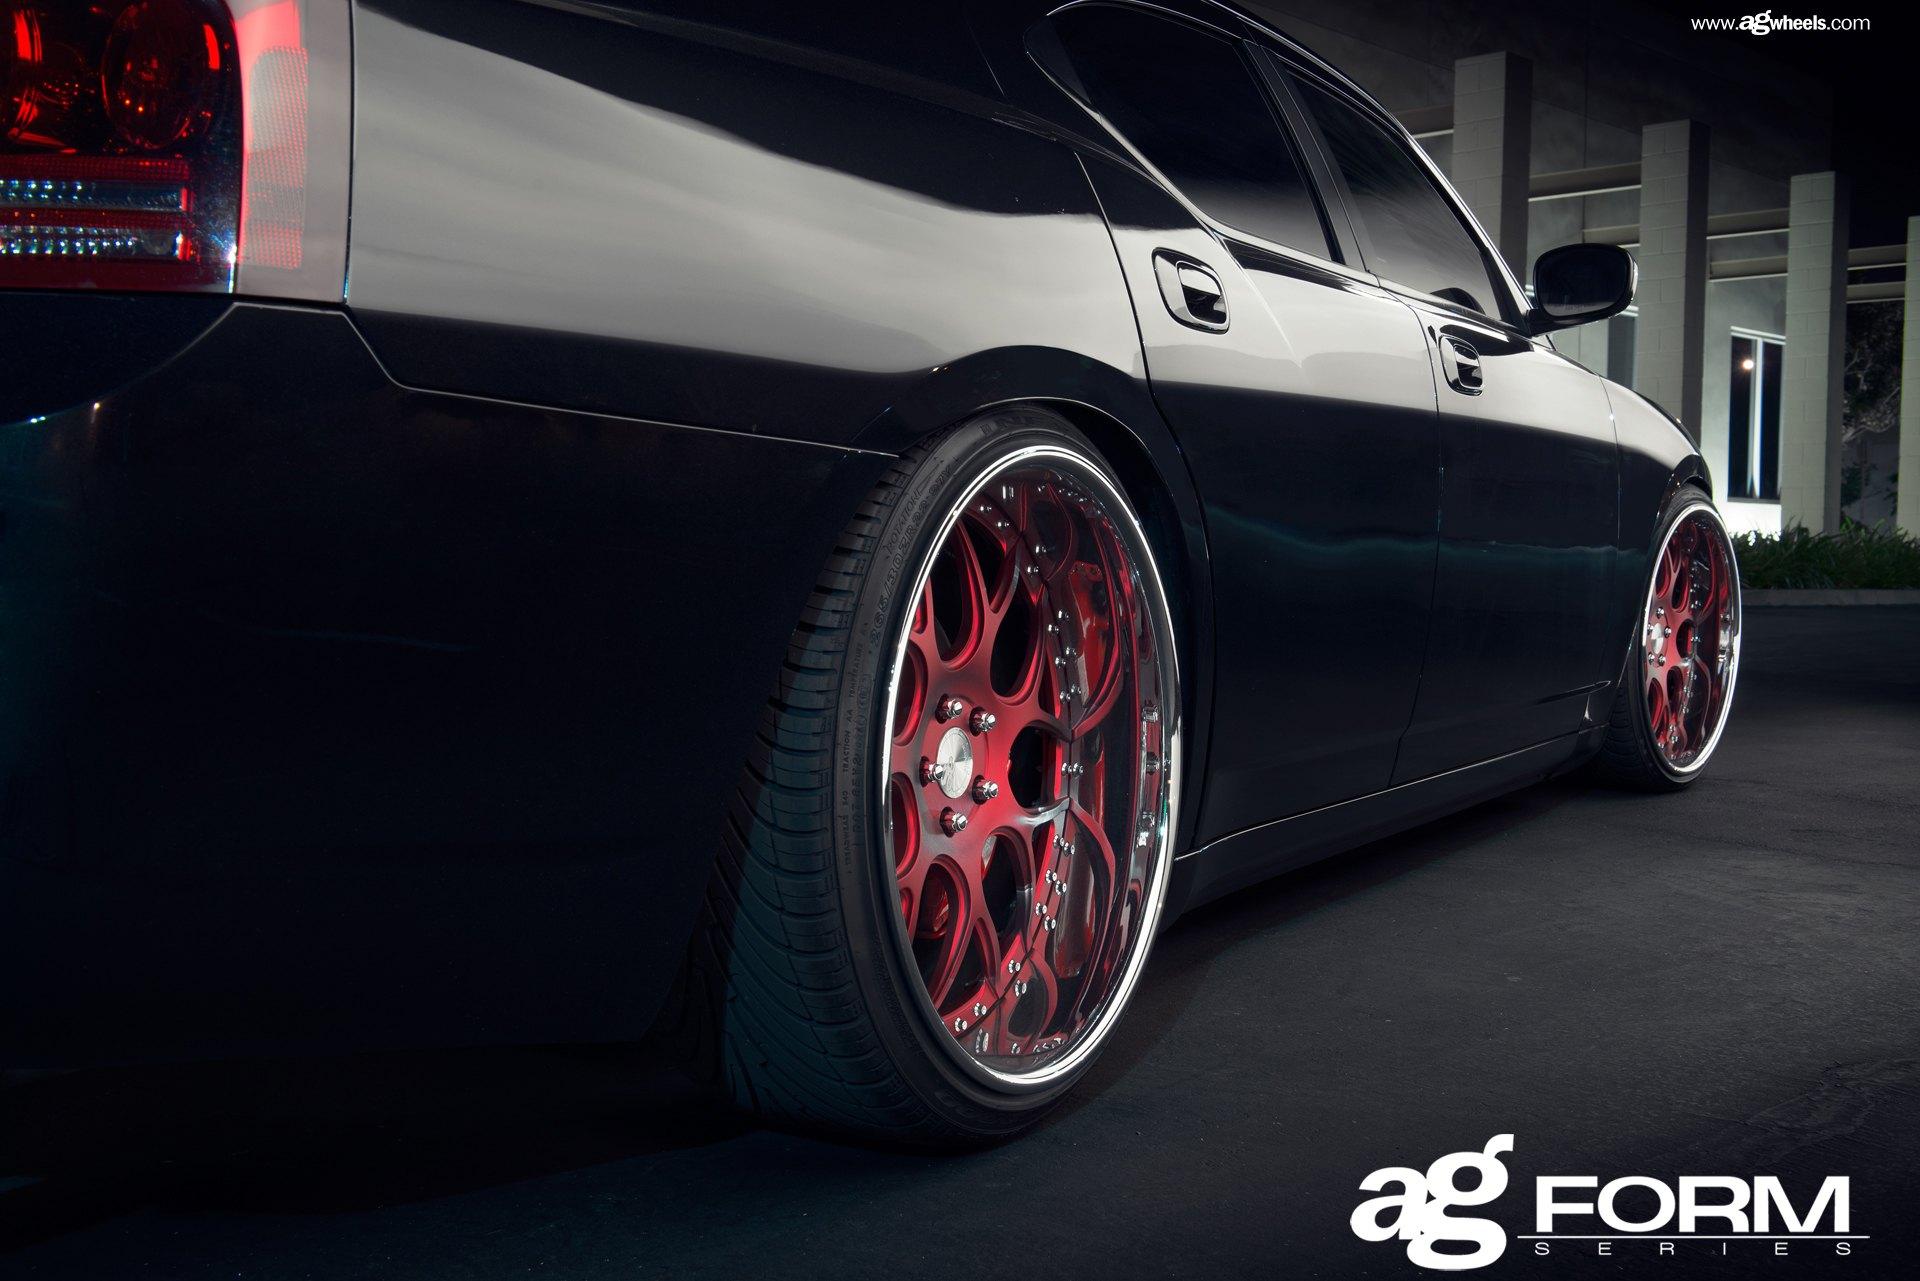 Avant Garde Red Custom Wheels With Polished Lips On Black